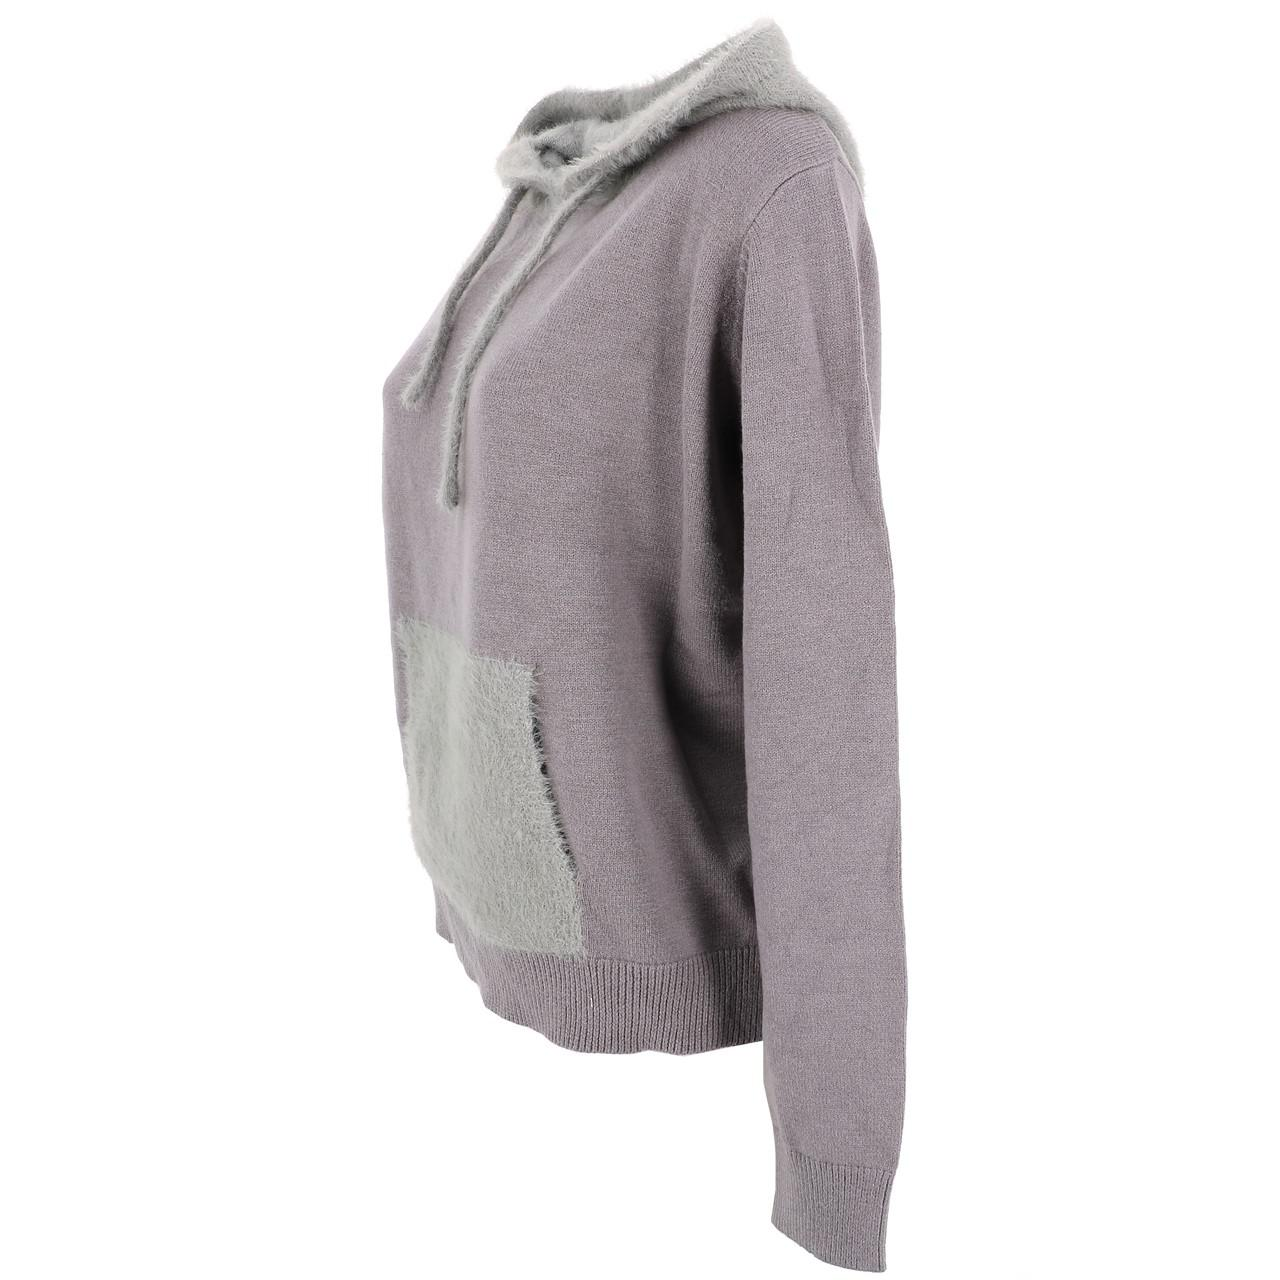 Sweat-Lcouture-Mohair-cap-w-gris-Gris-53717-Neuf miniature 4